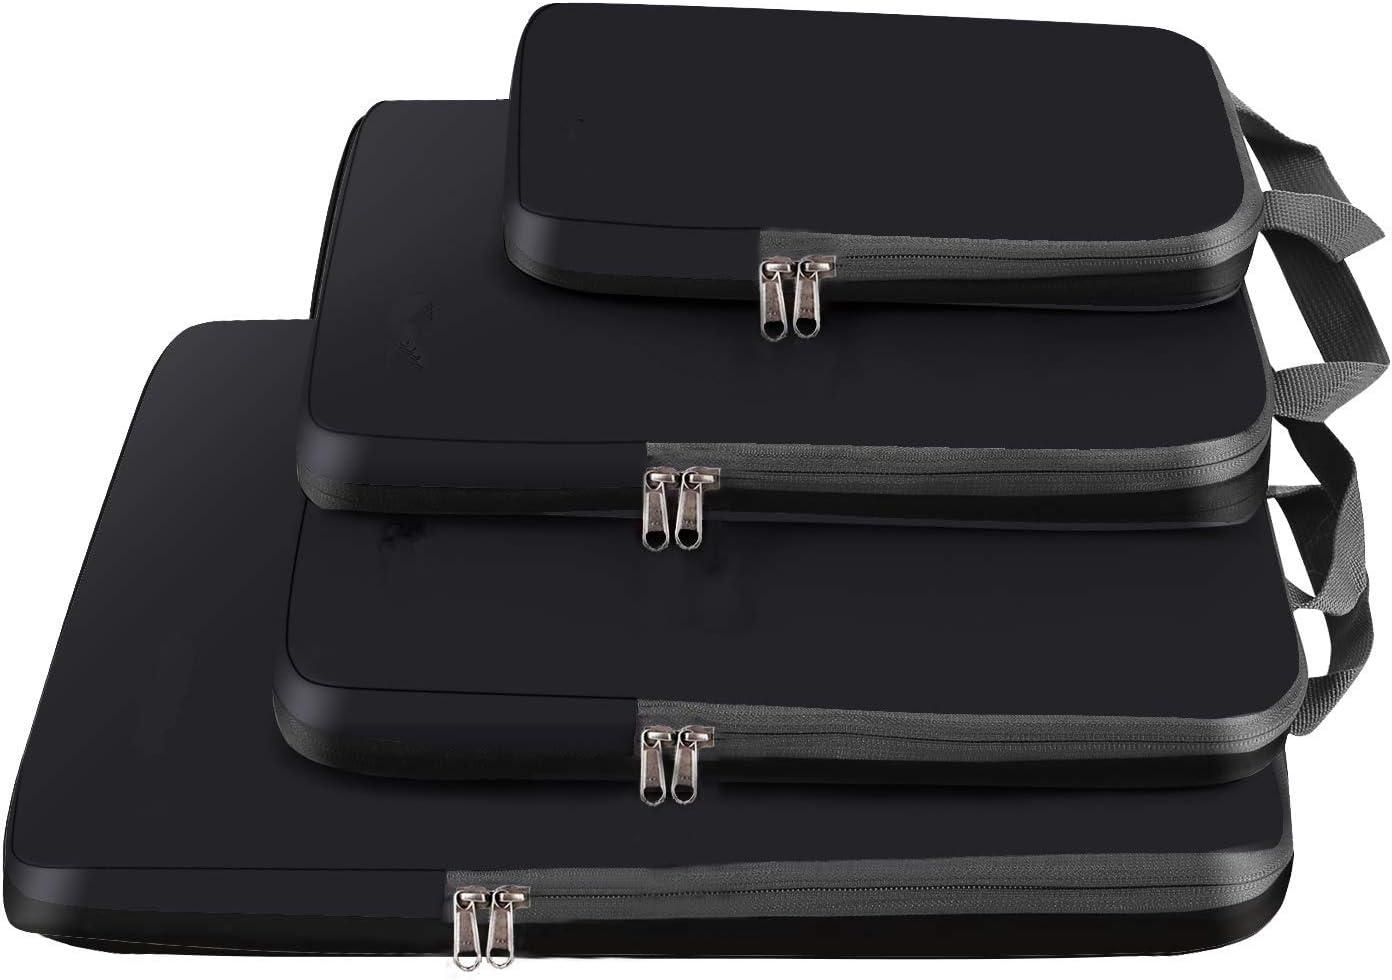 Flamingo,4 Set Bagail 4 Set//6 Set Compression Packing Cubes Travel Expandable Packing Organizers